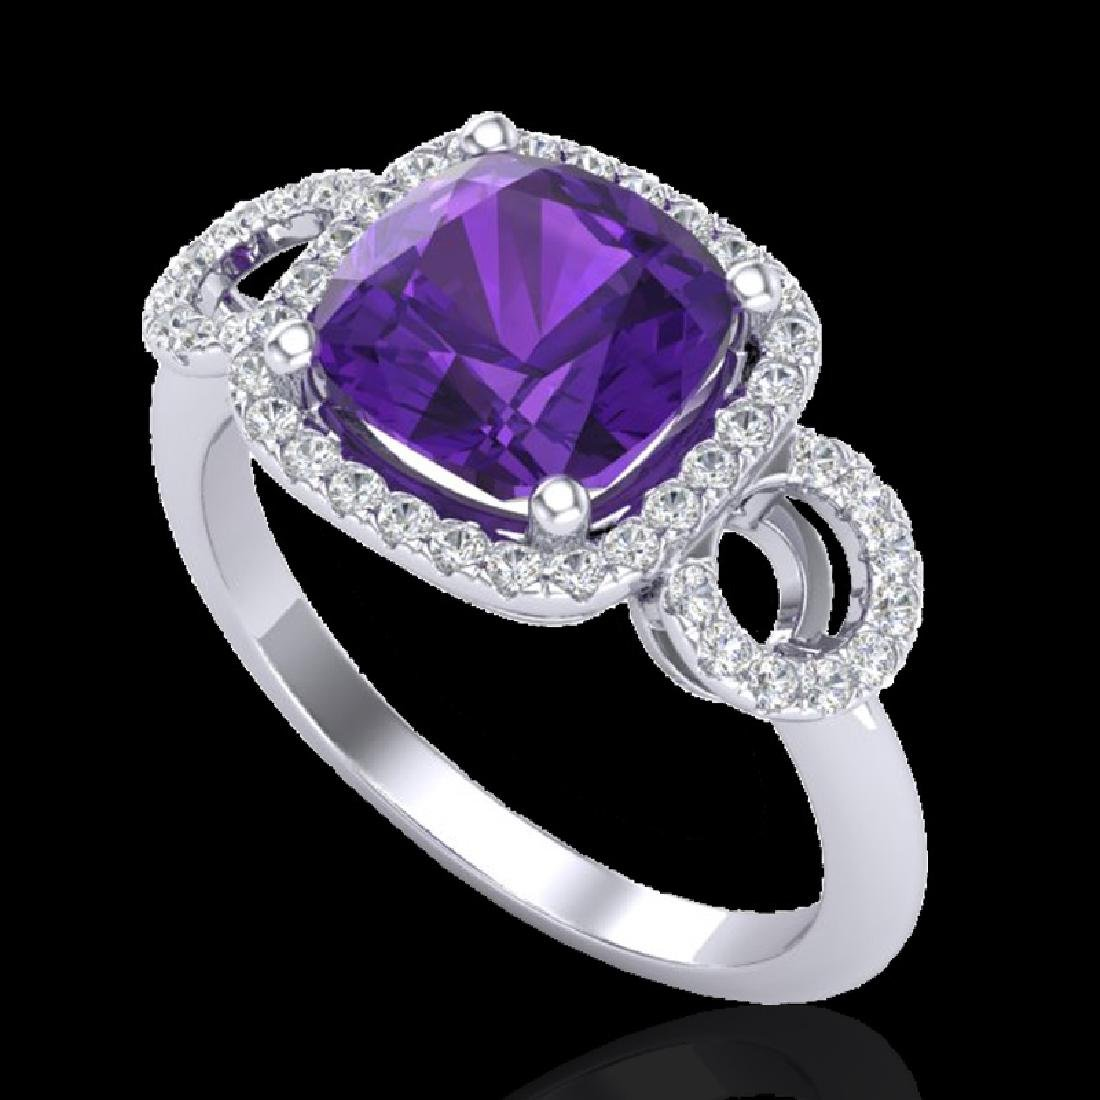 3.75 CTW Amethyst & Micro VS/SI Diamond Ring 18K White - 2